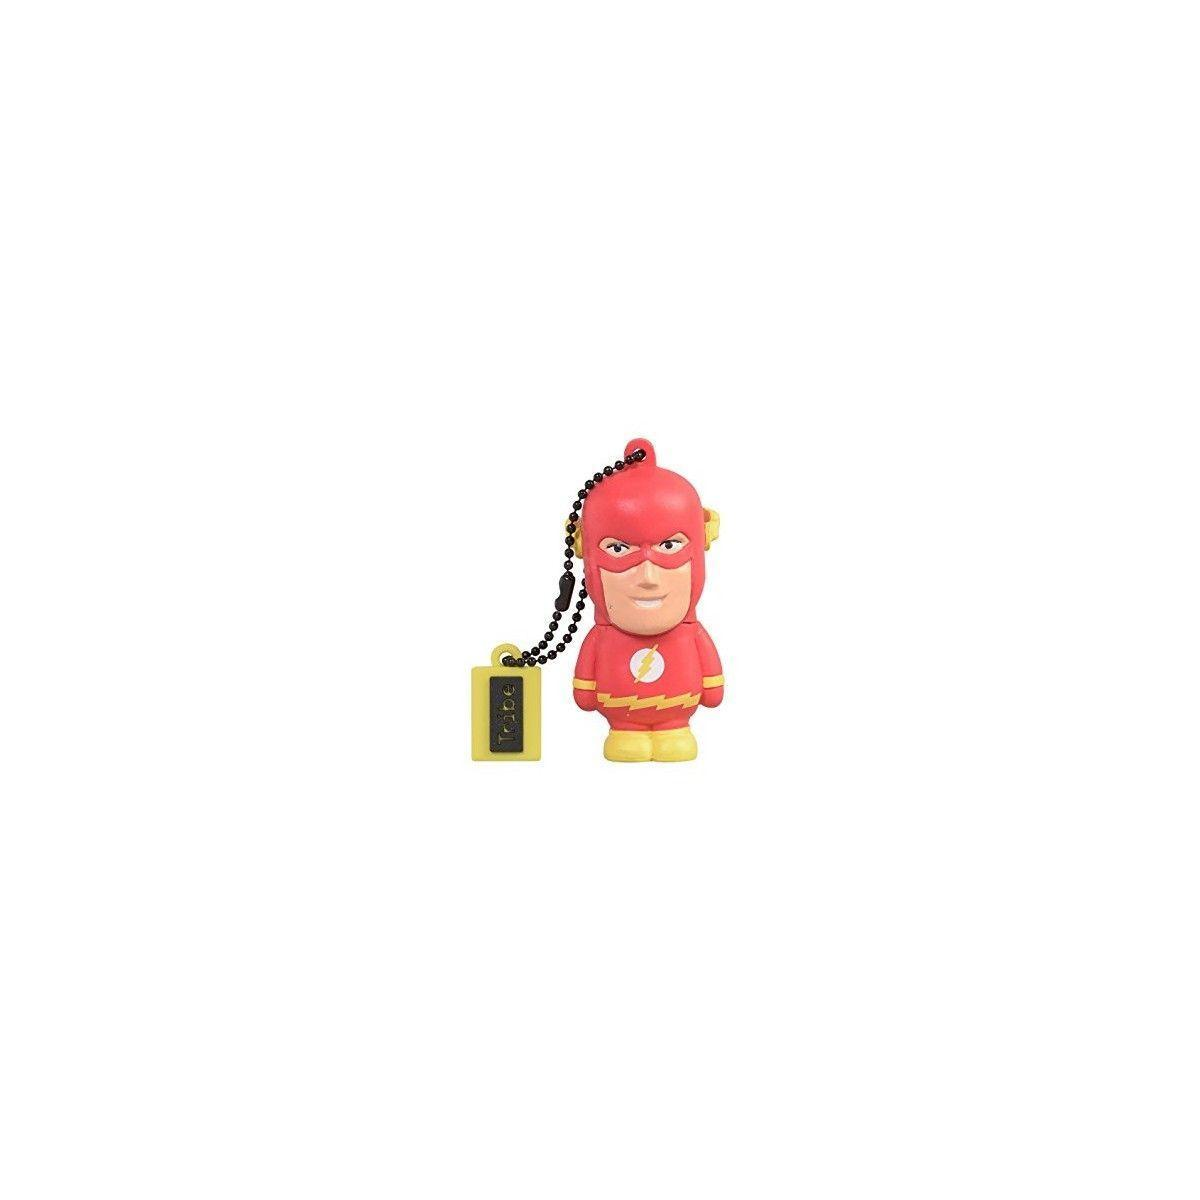 Clé USB FD 031506